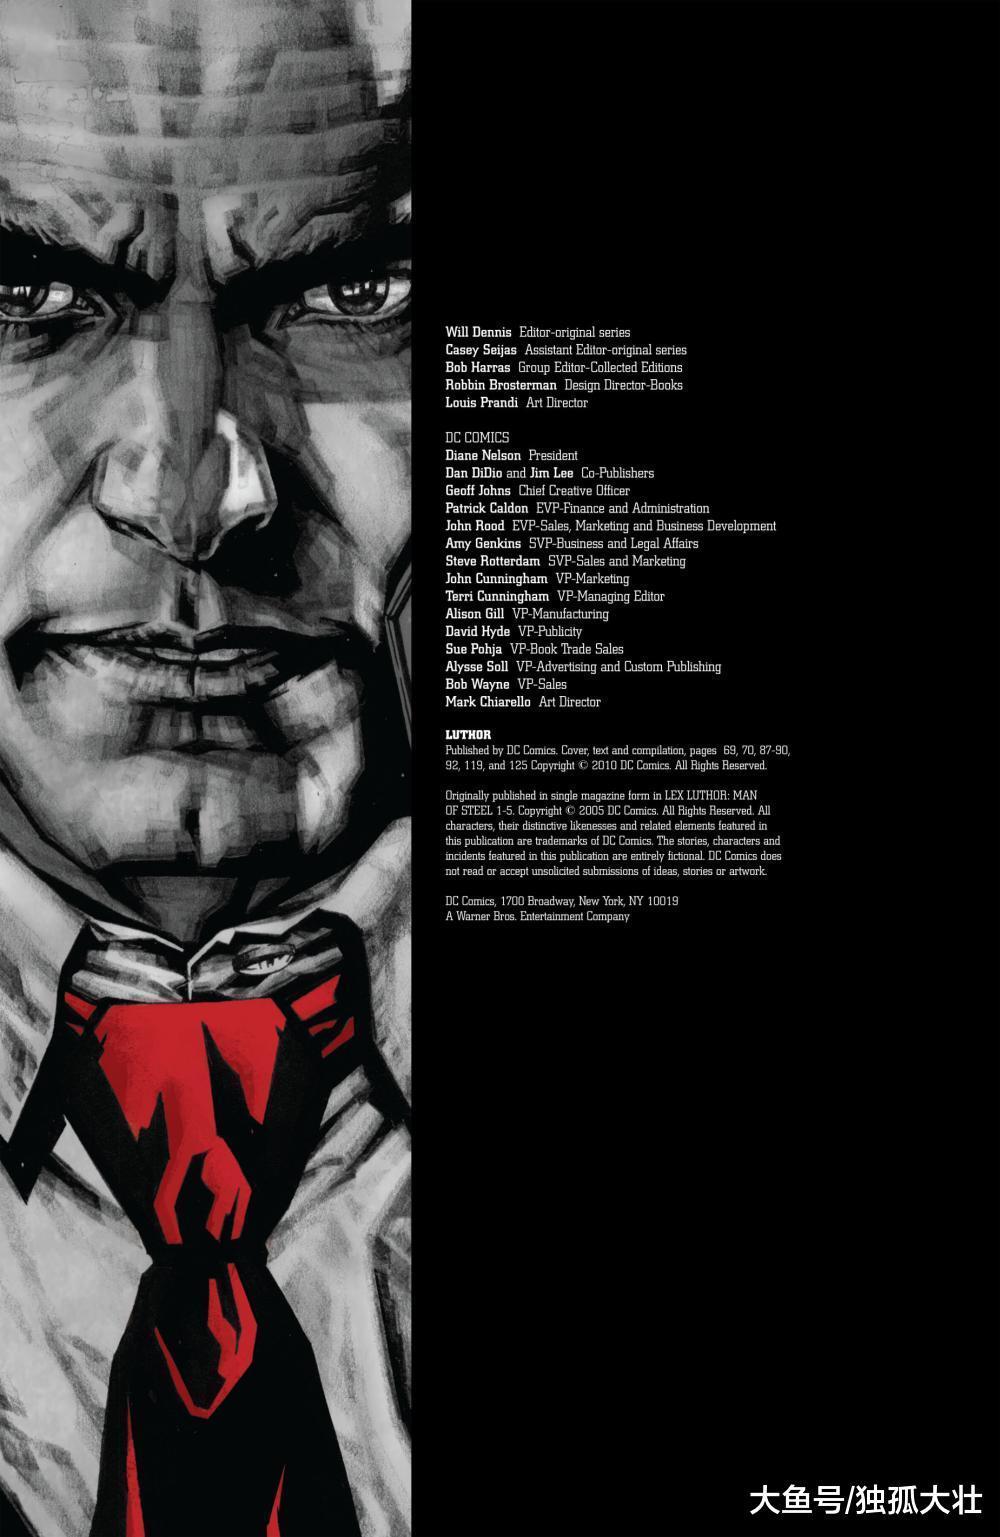 DC黑标计划: 致命玩笑和黑暗骑士归来都将会重印, 最经典的故事!